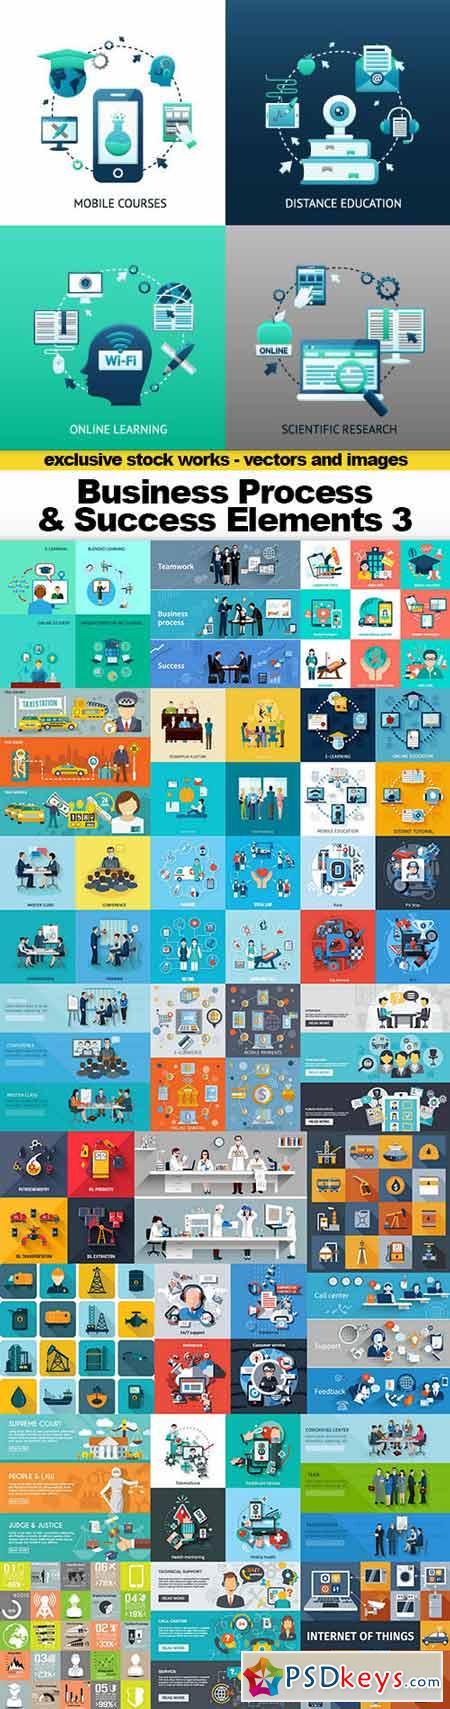 Business Process & Success Elements 3 - Flat Collection, 25x EPS